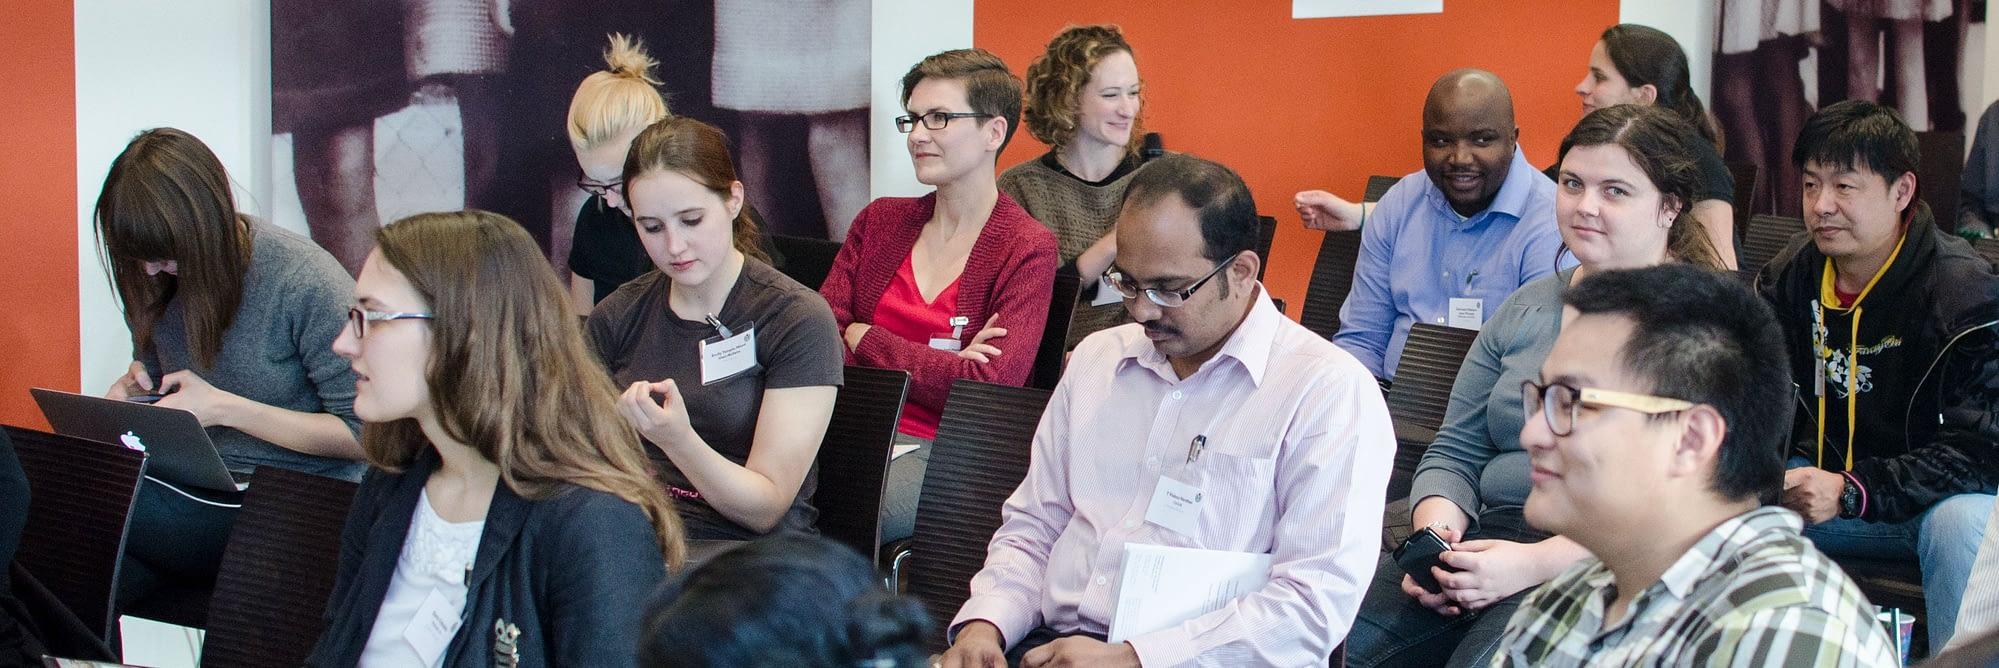 pre-MBA diversity conference